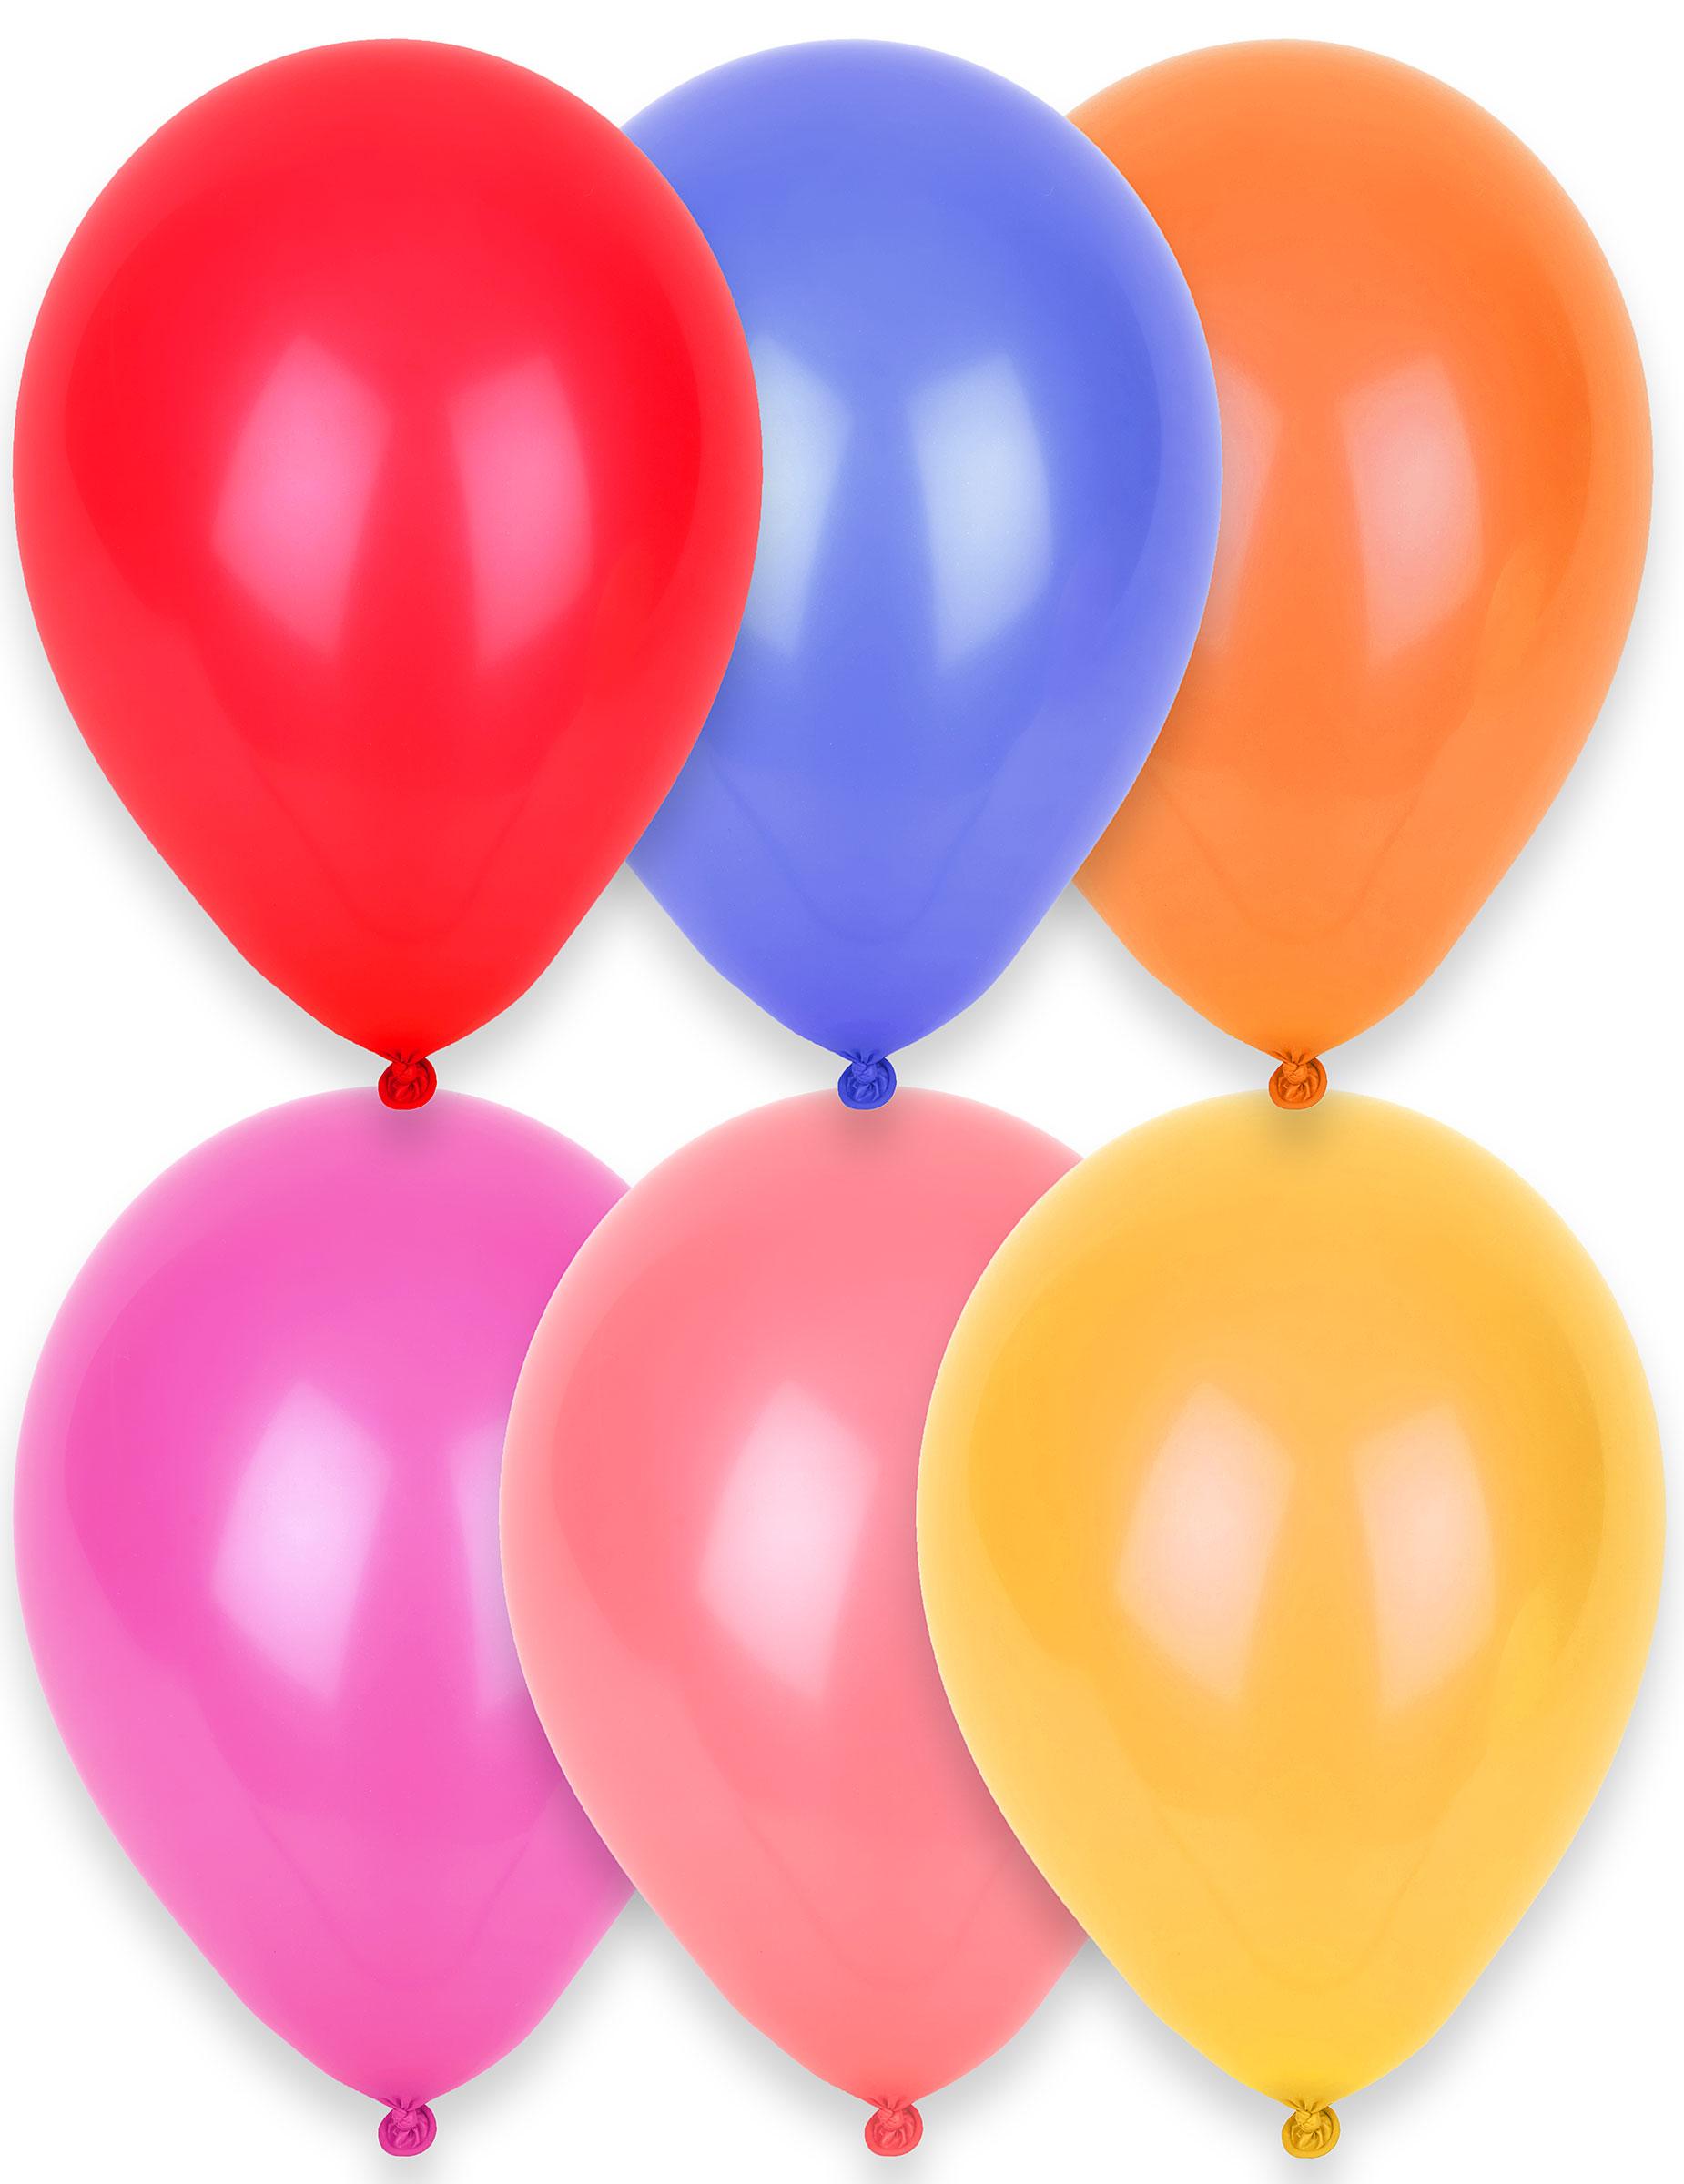 party luftballons party deko 24 st ck bunt 28cm g nstige faschings partydeko zubeh r bei. Black Bedroom Furniture Sets. Home Design Ideas